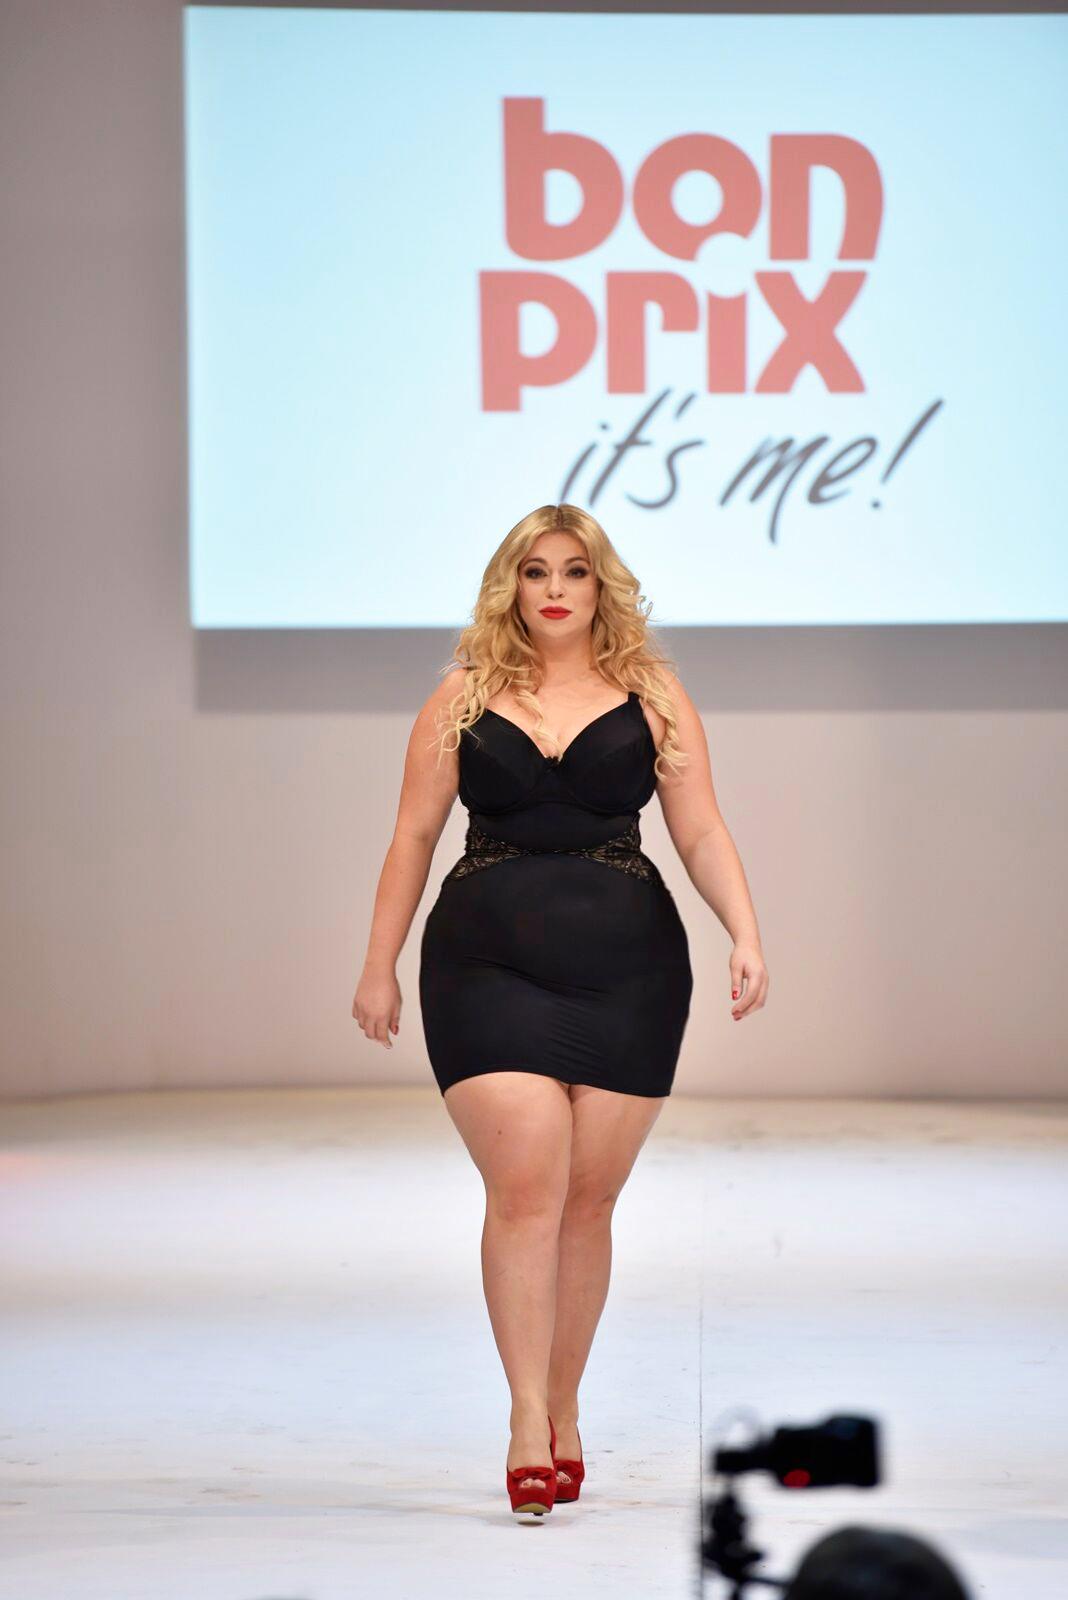 bonprix-Beauty-Curvy-Tv-moderatorin-Megabambi-Caterina-pogorzelski-Plusmodel-Schauspielerin-Tv-Moderatorin-curvyblogger-mollig